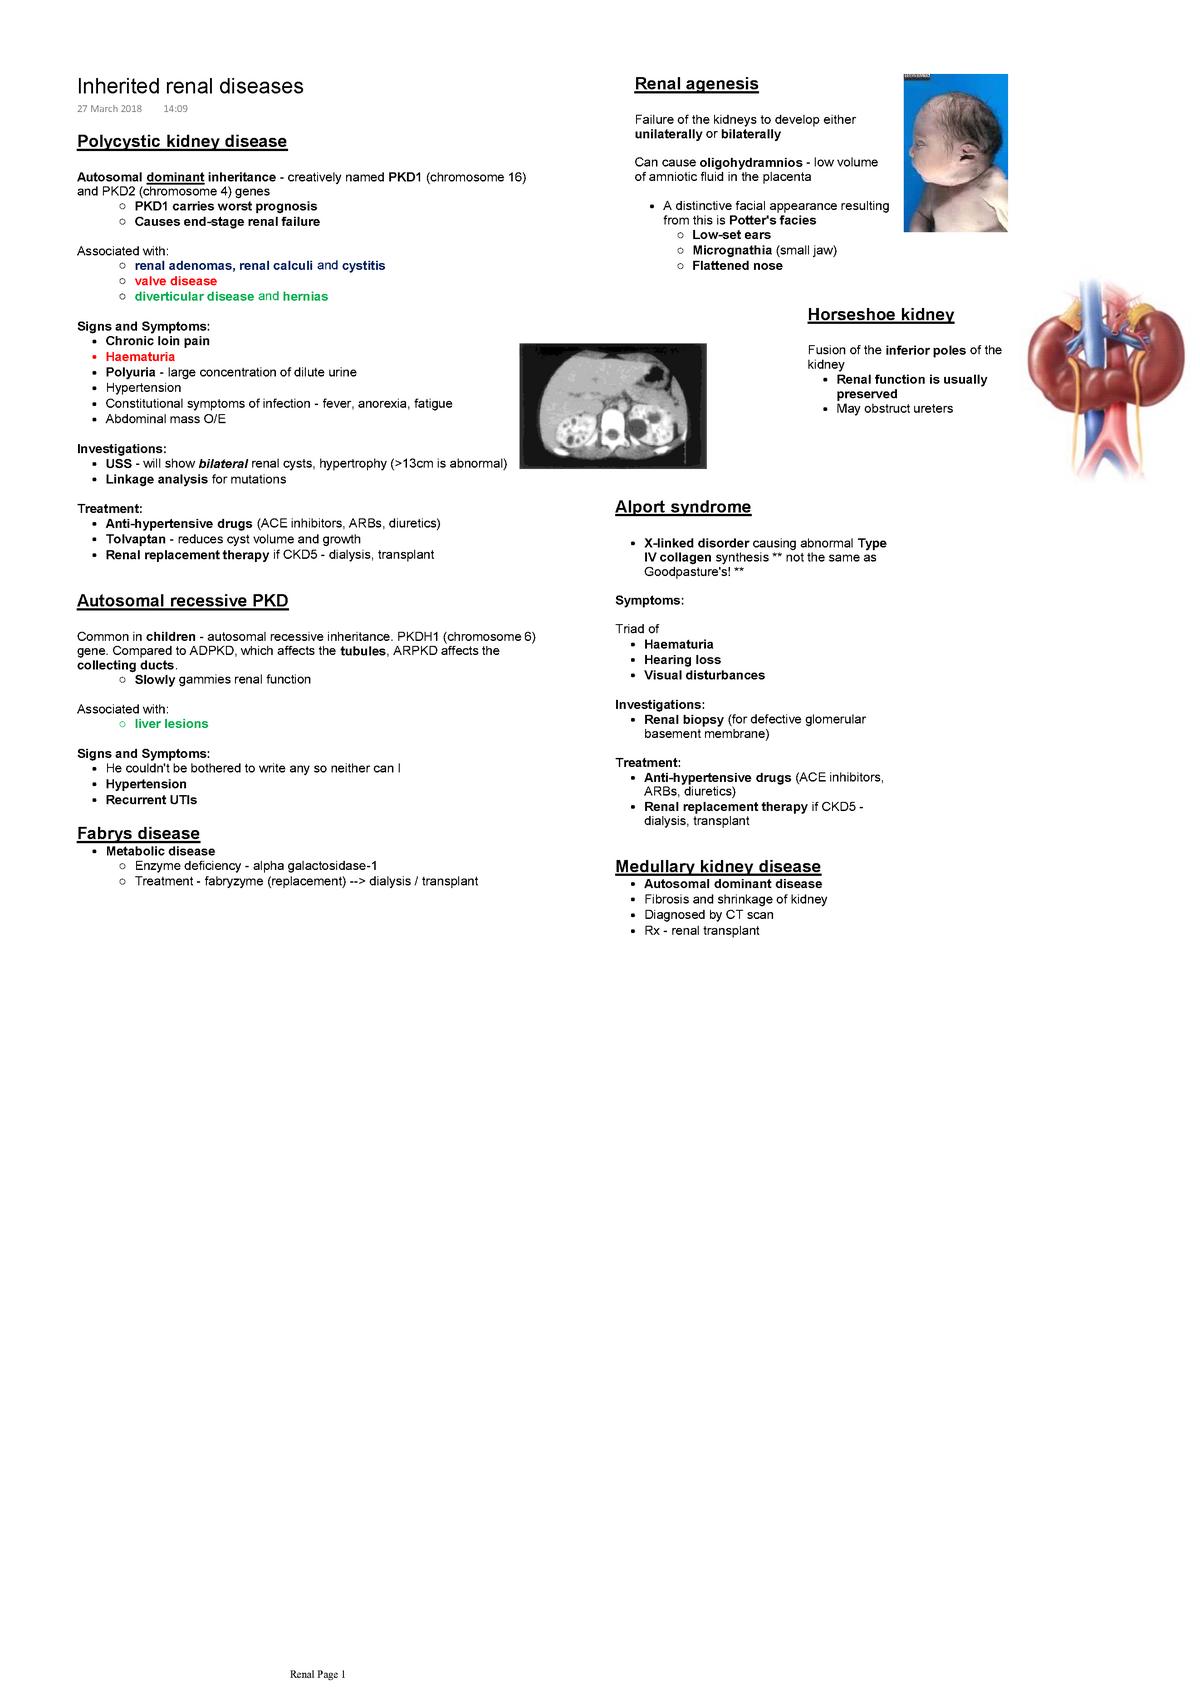 agenesia renal faciesa